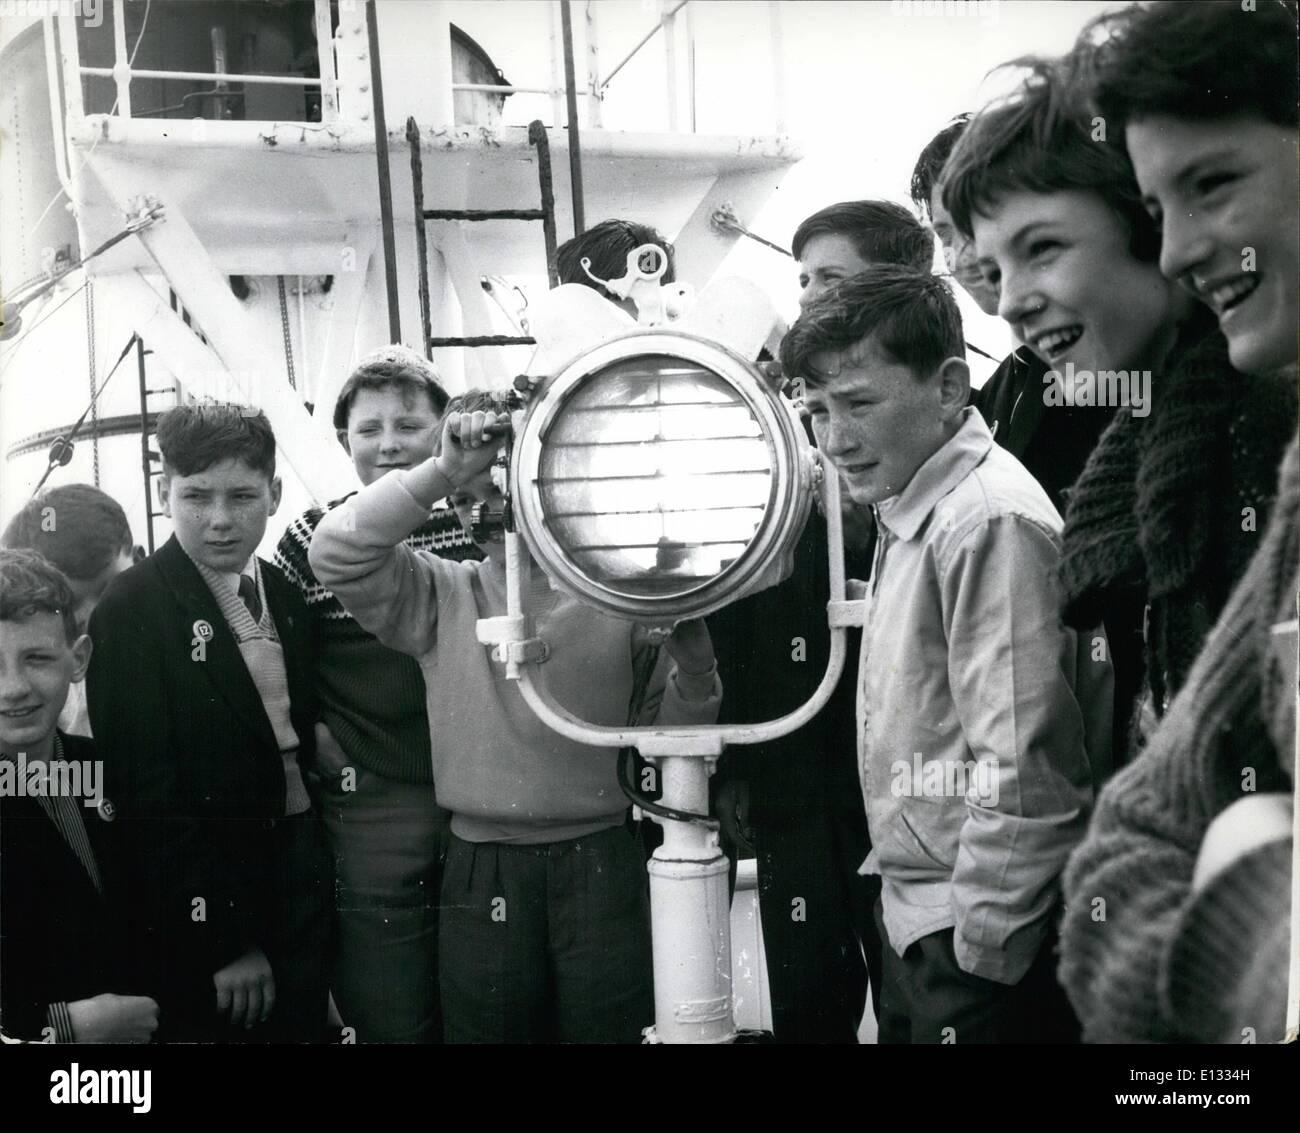 Feb. 26, 2012 - Working the Morse lamp - a class on the bridge. - Stock Image